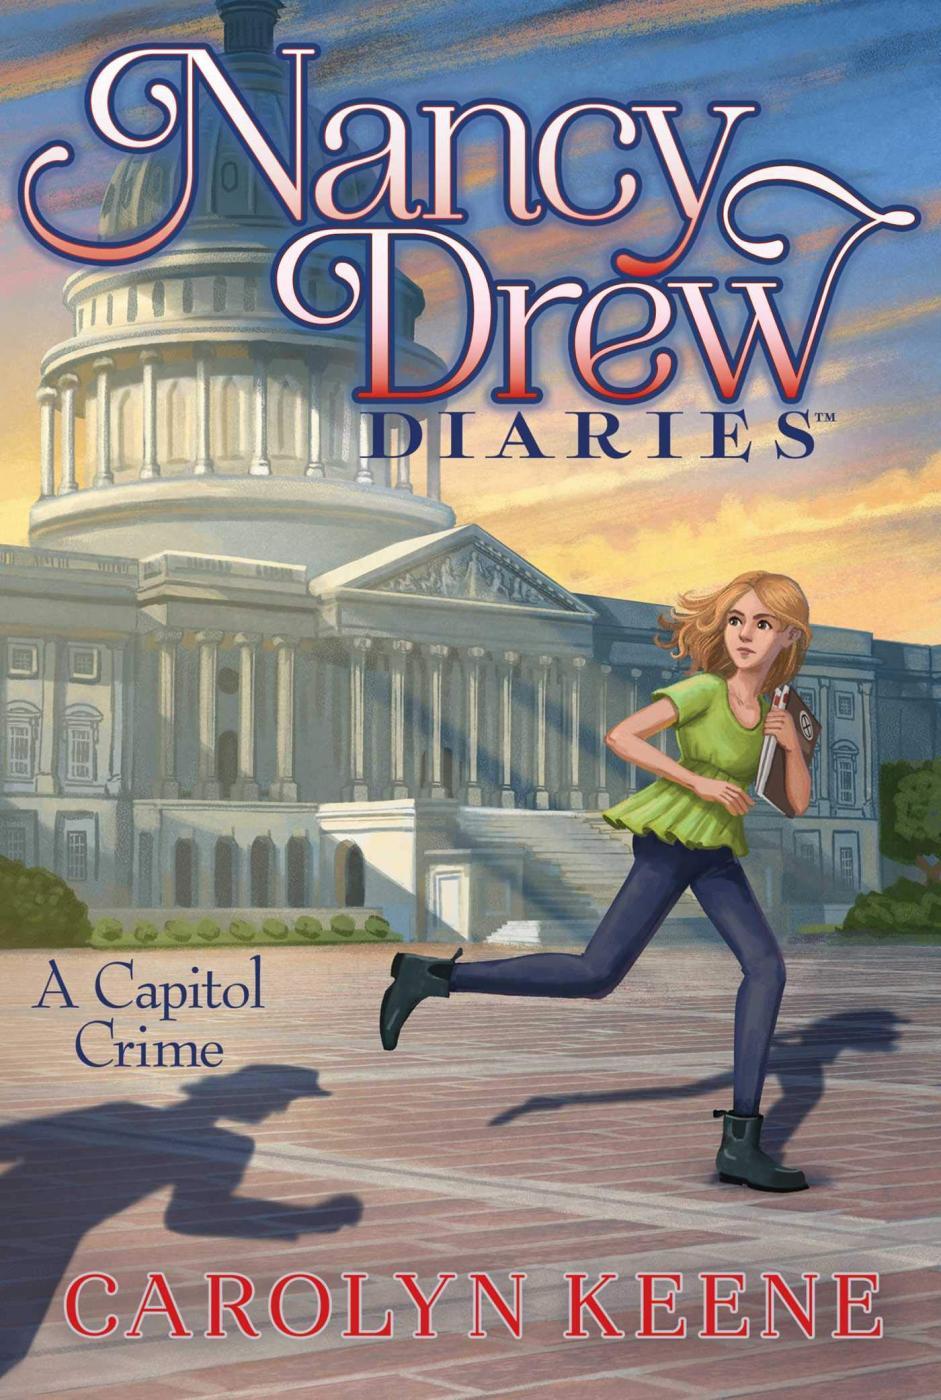 A Capitol crime by Keene, Carolyn